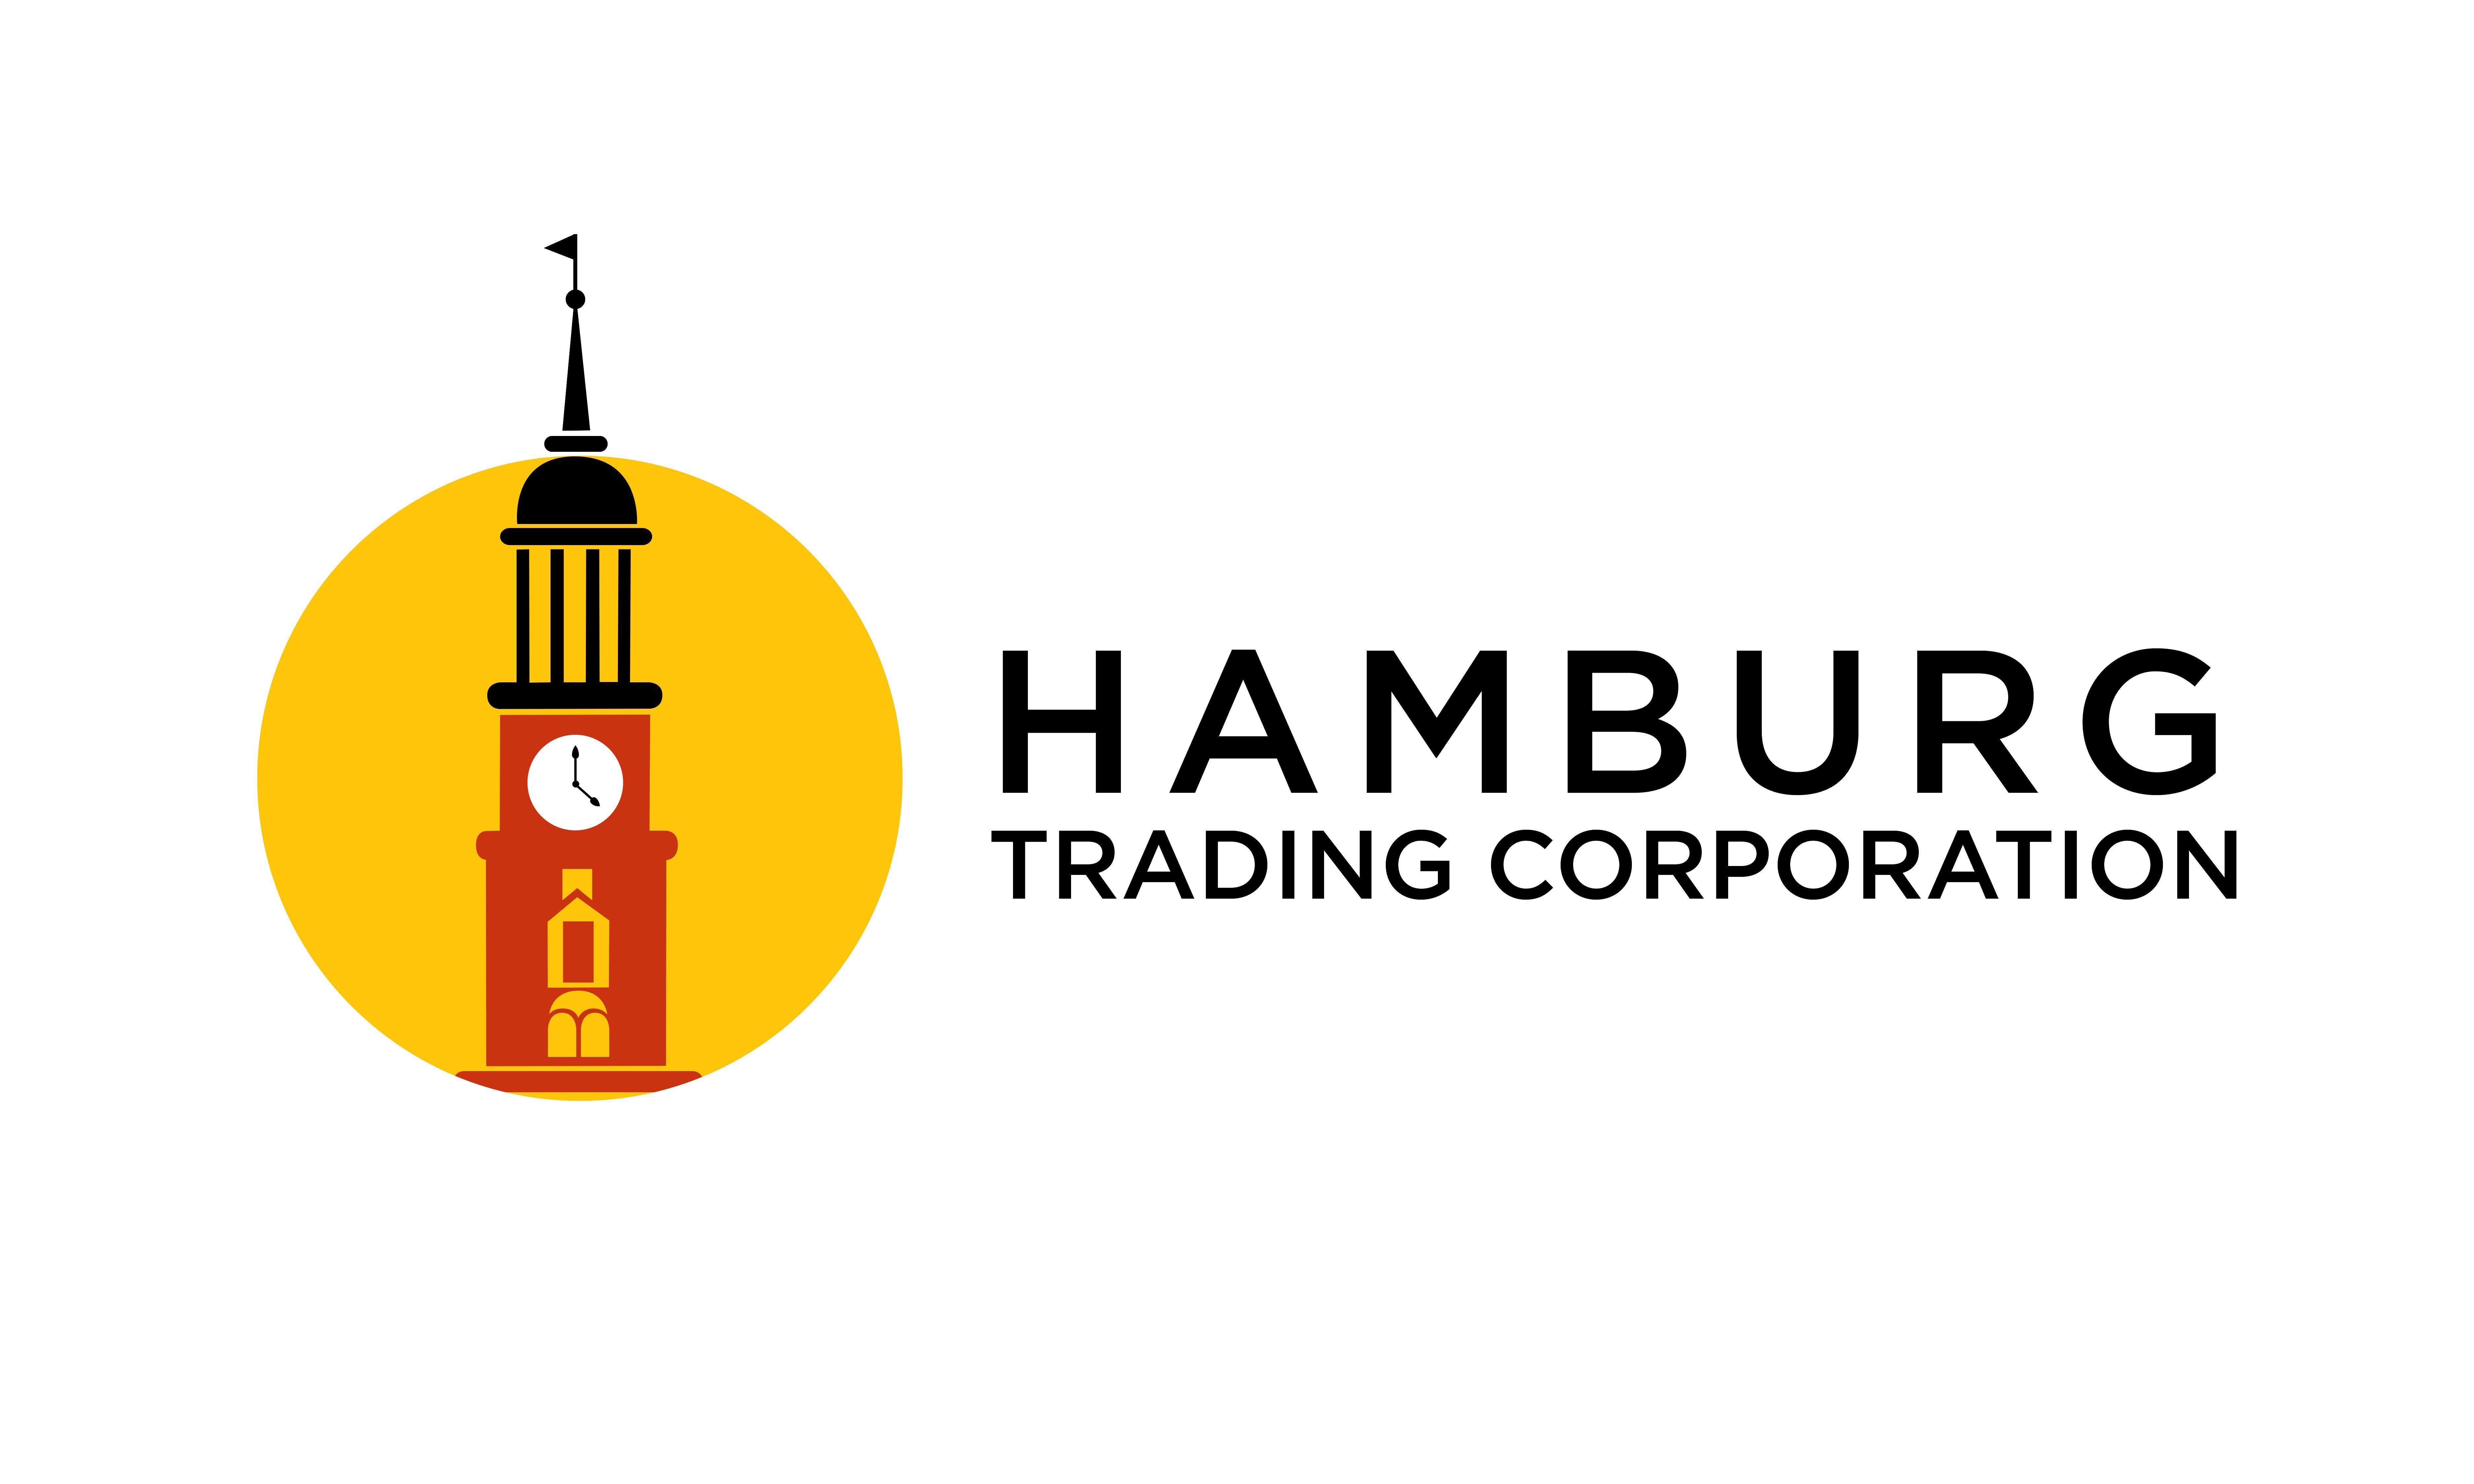 Hamburg Trading Corporation